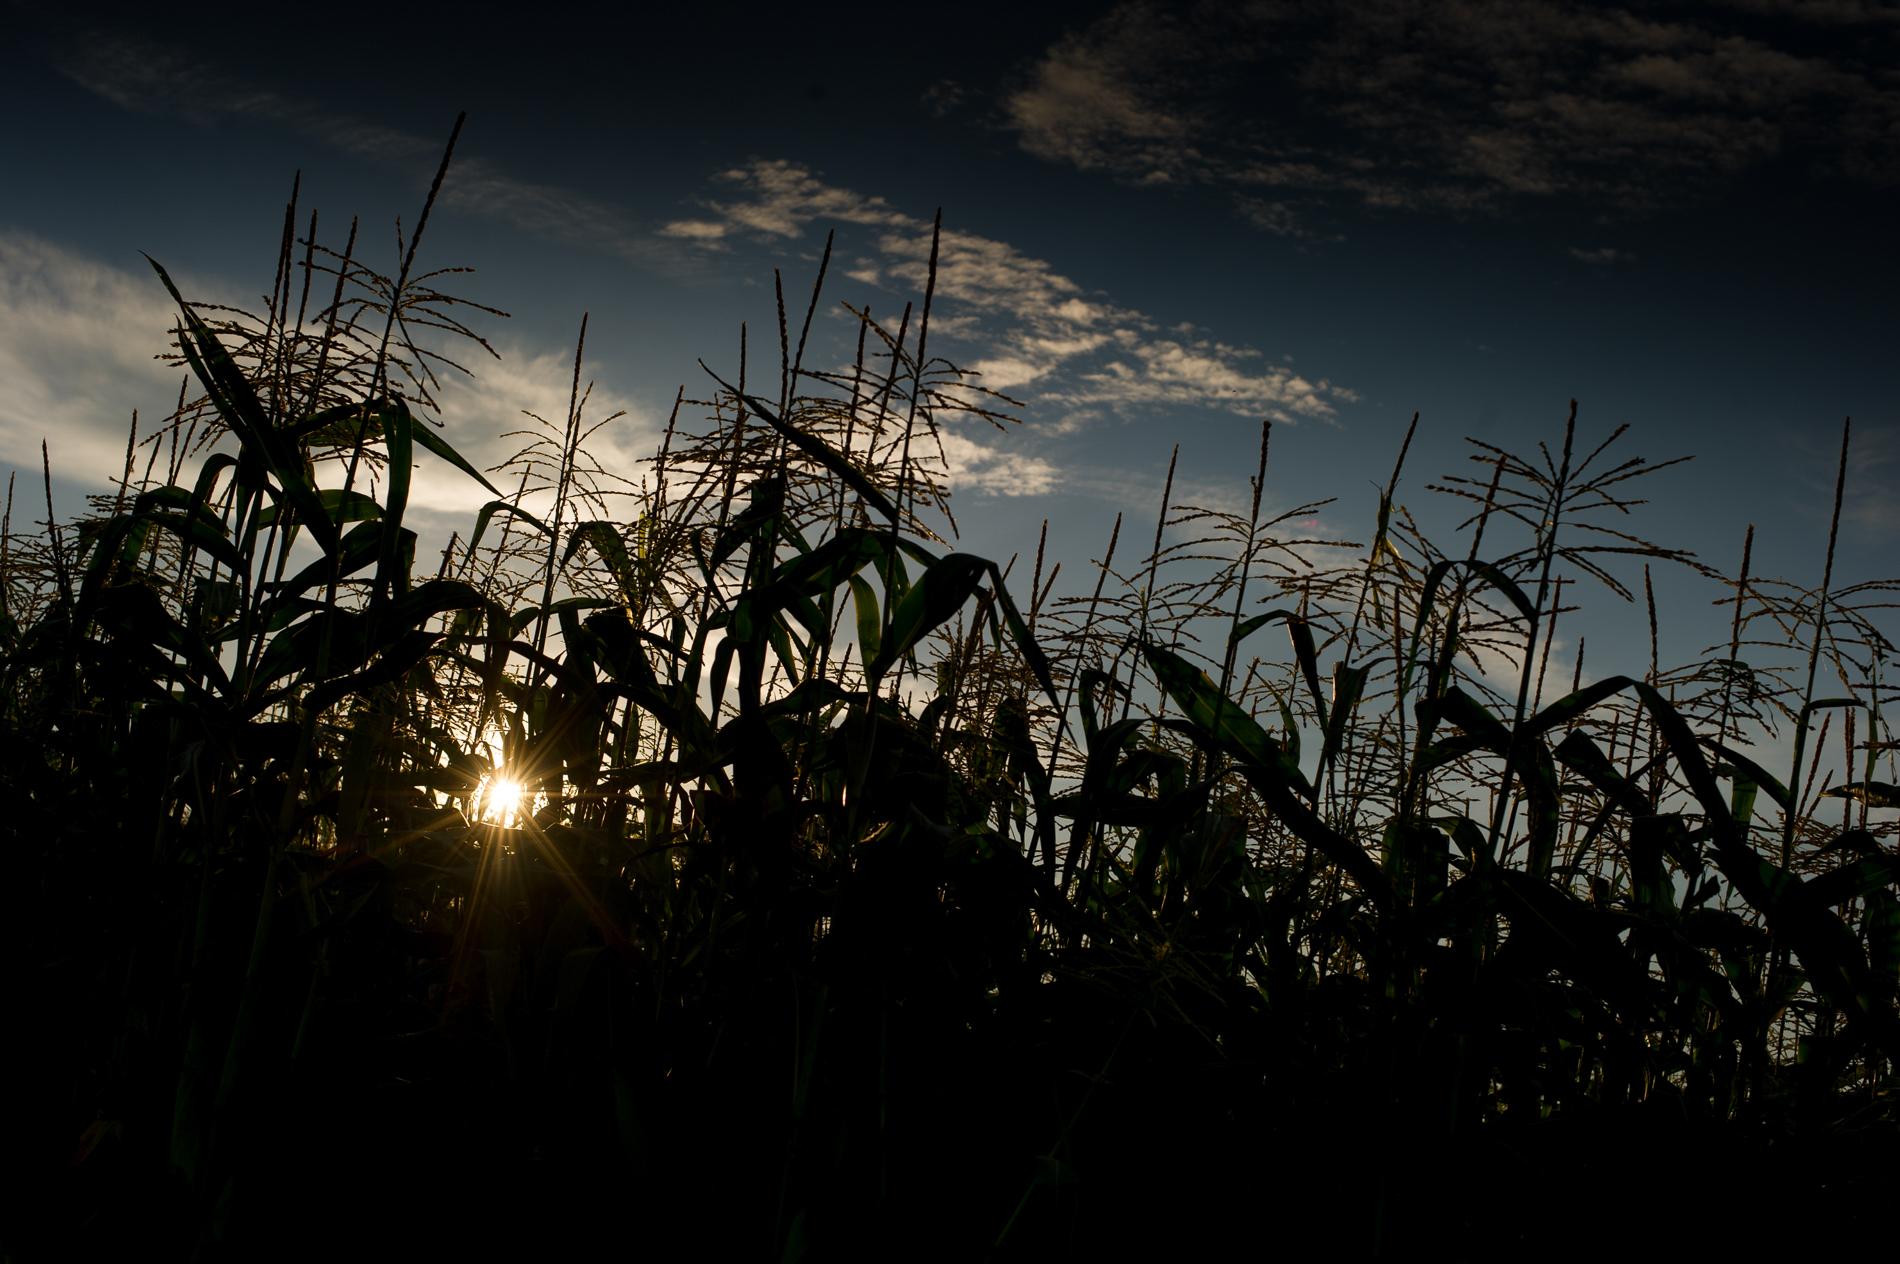 Corn at Sunset